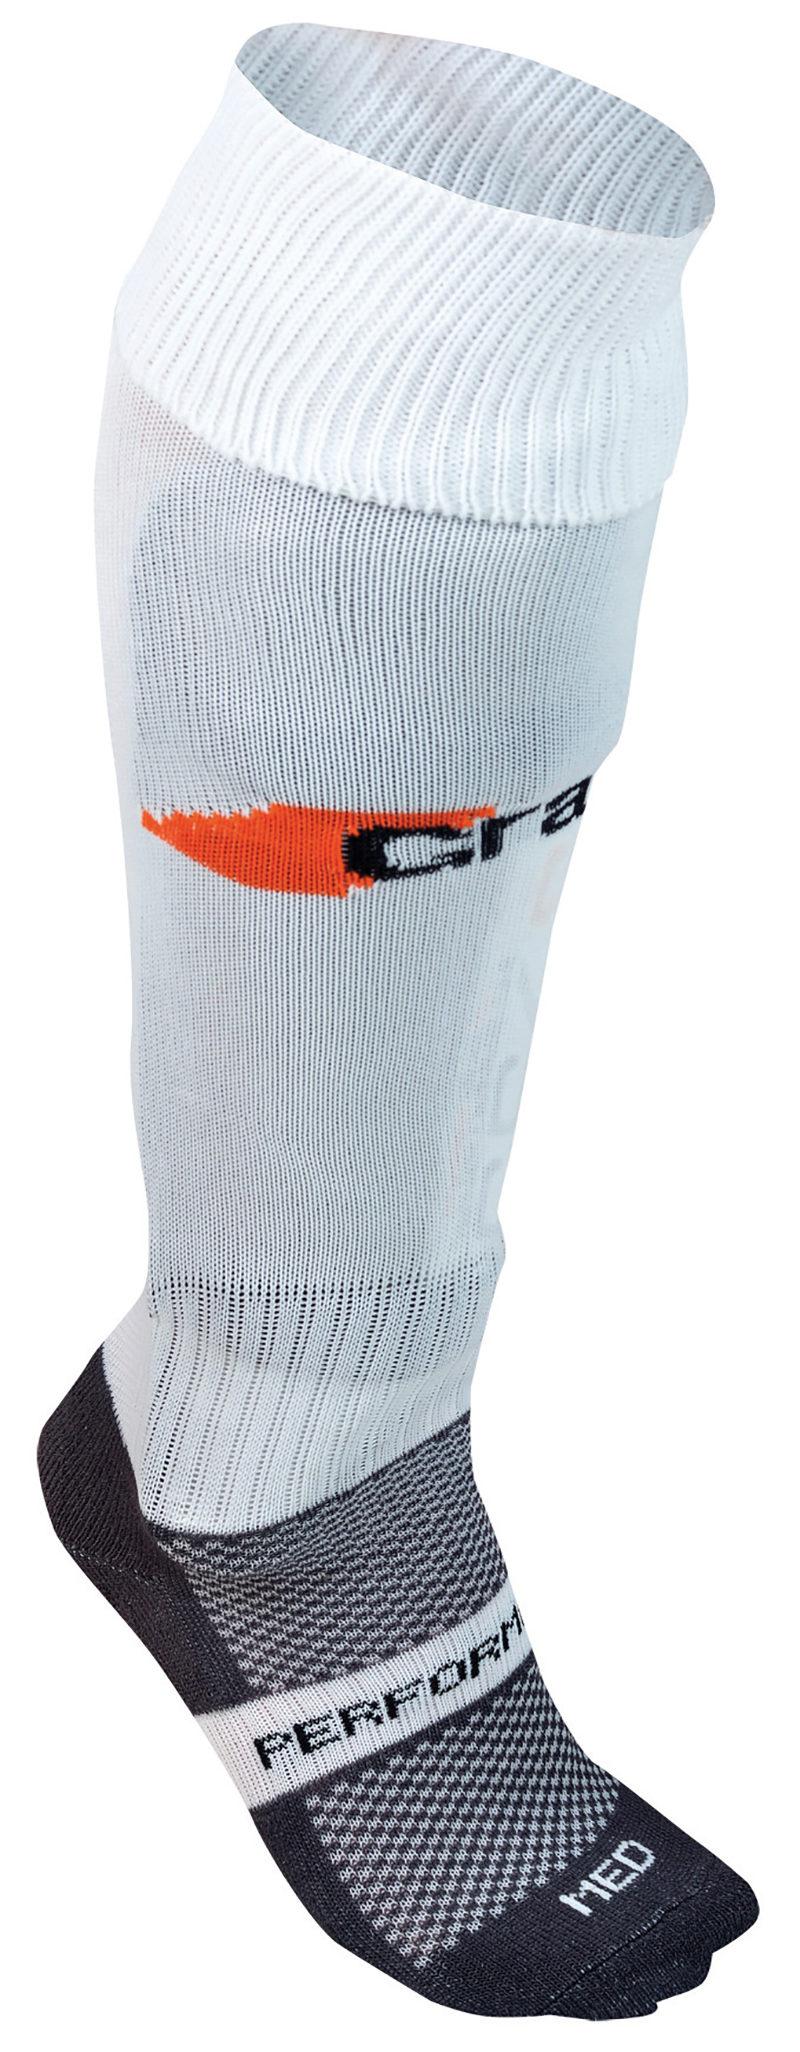 G650 hockey sock